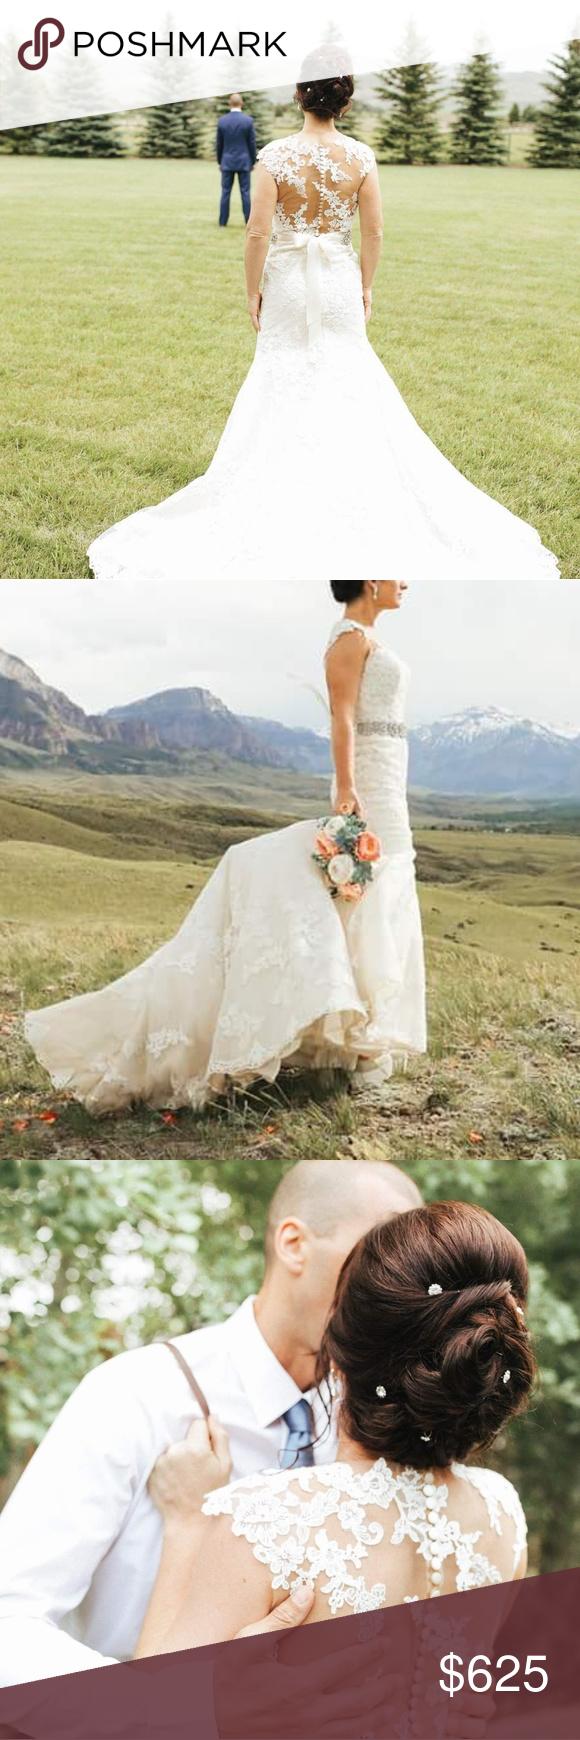 The bustle wedding dresses  Pronovias Wedding Dress  Pronovias wedding dresses French bustle